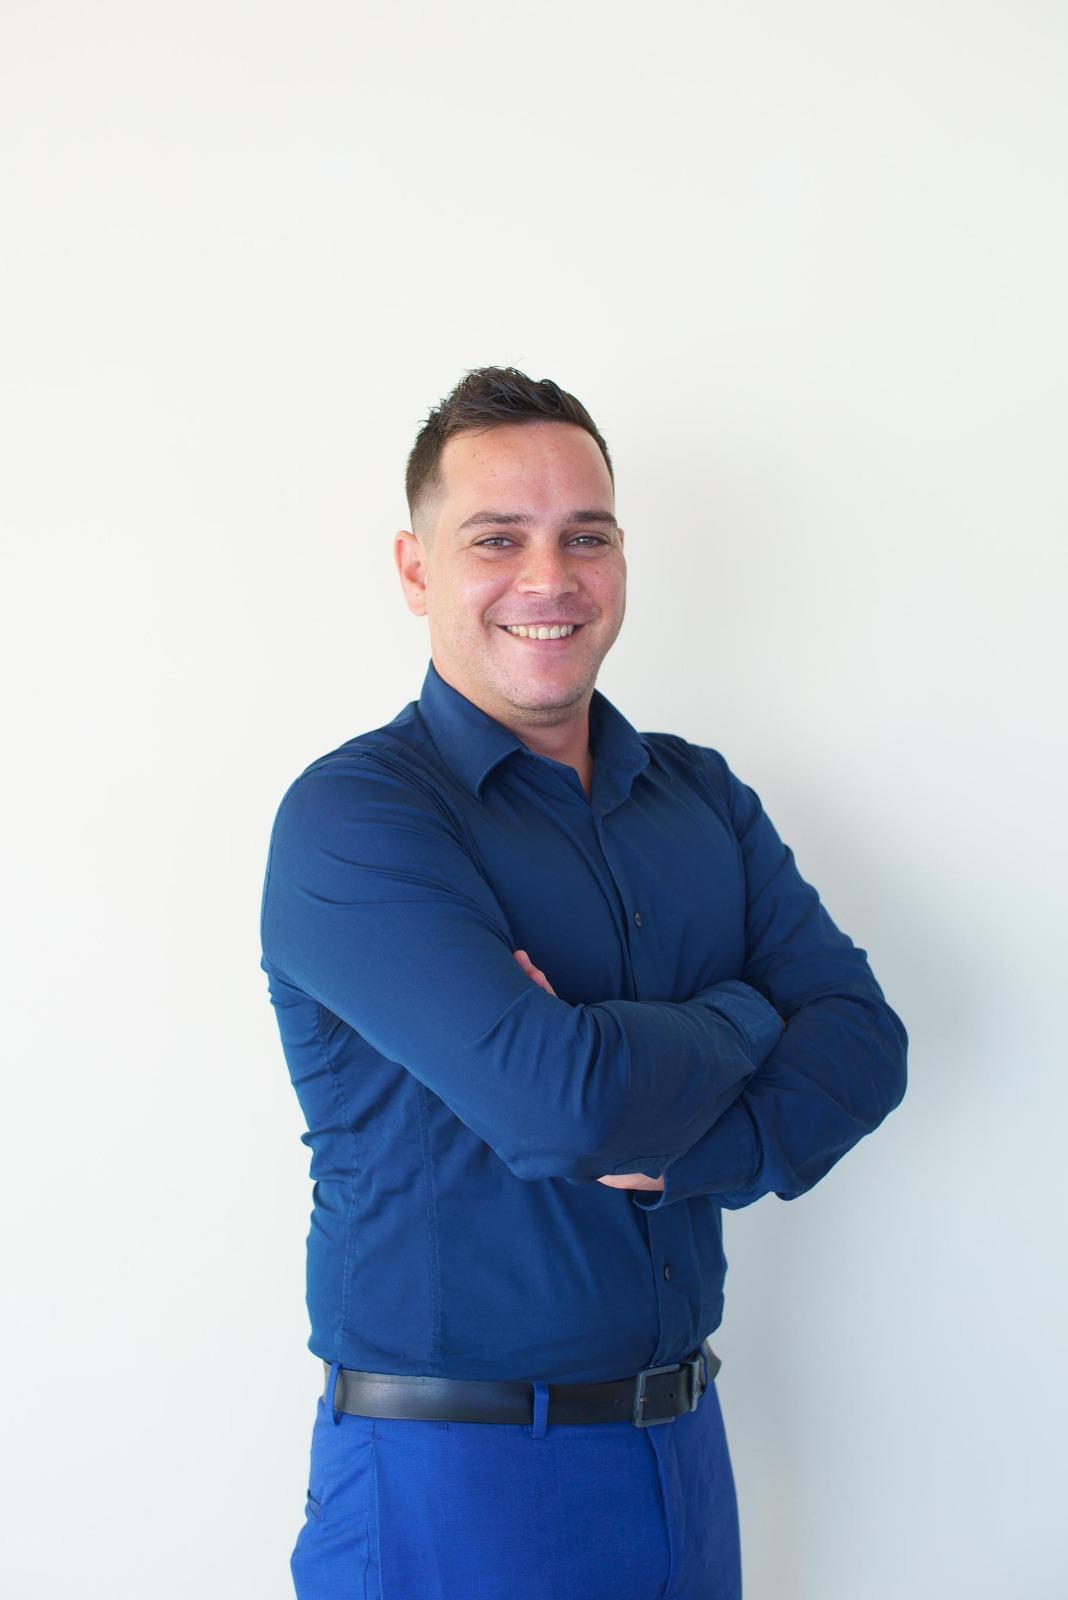 Marco Antonio Domínguez Ramírez